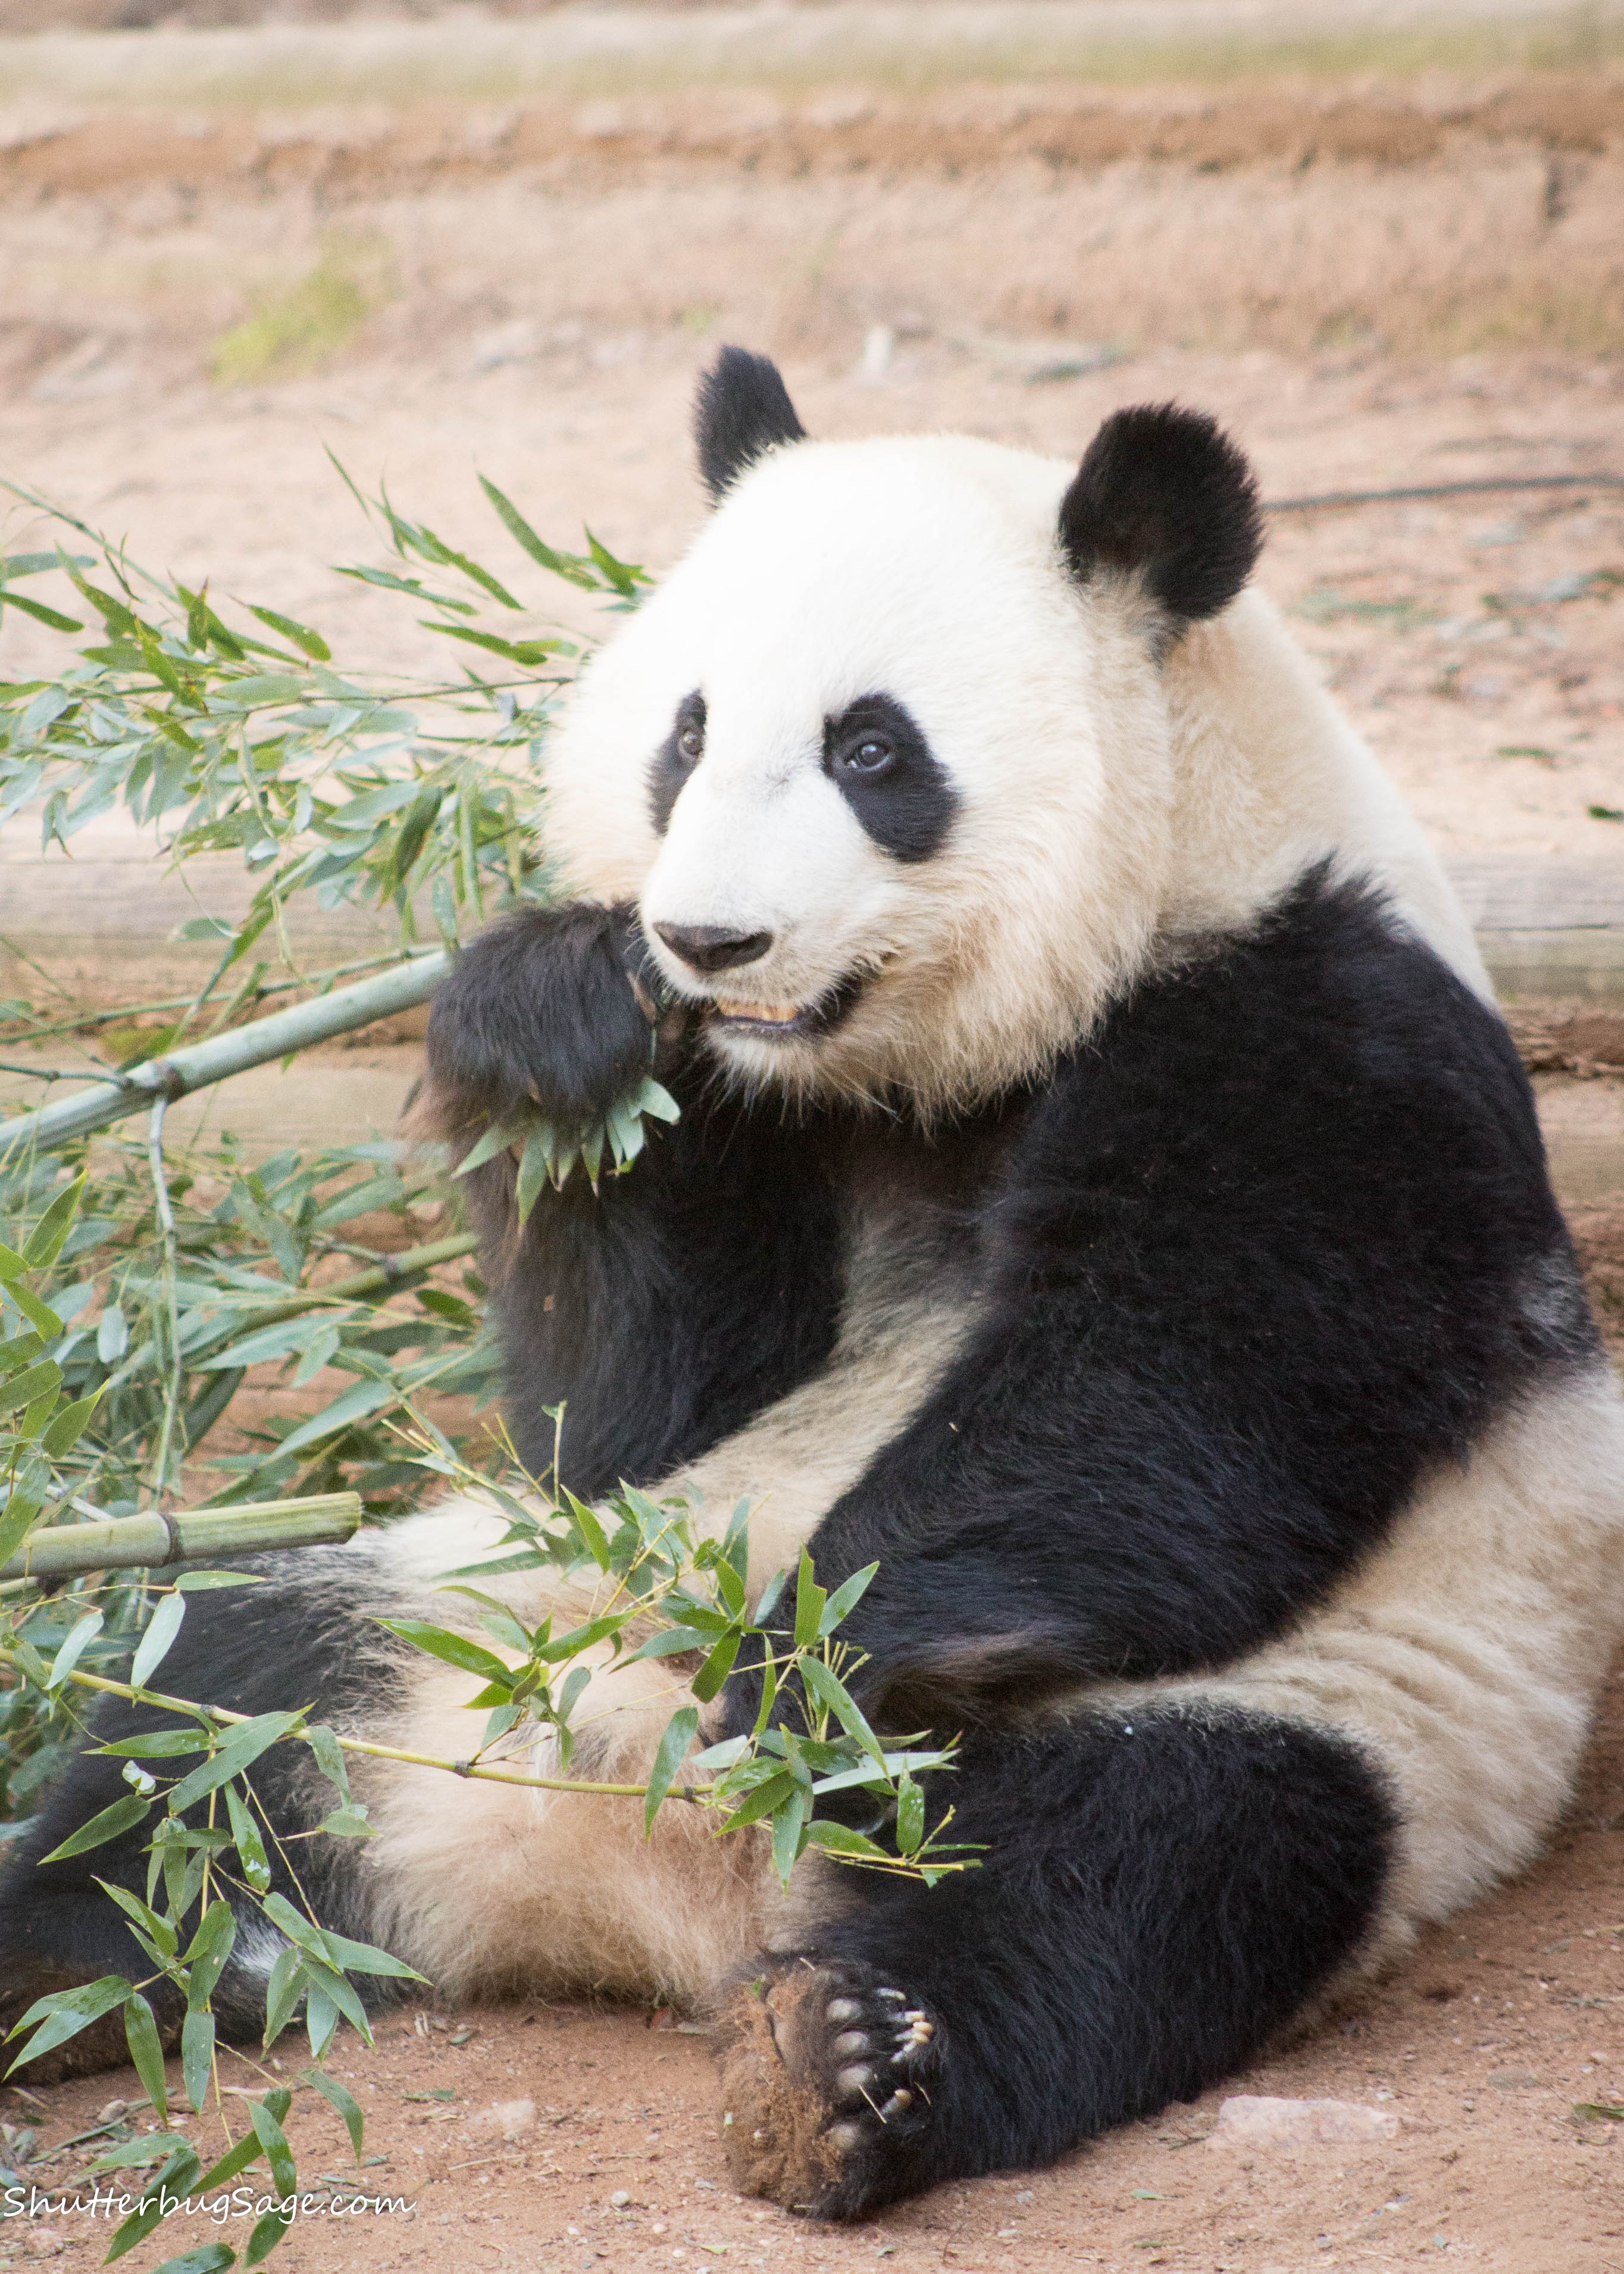 Zoo Atlanta: Giant Pandas | ShutterbugSage.com